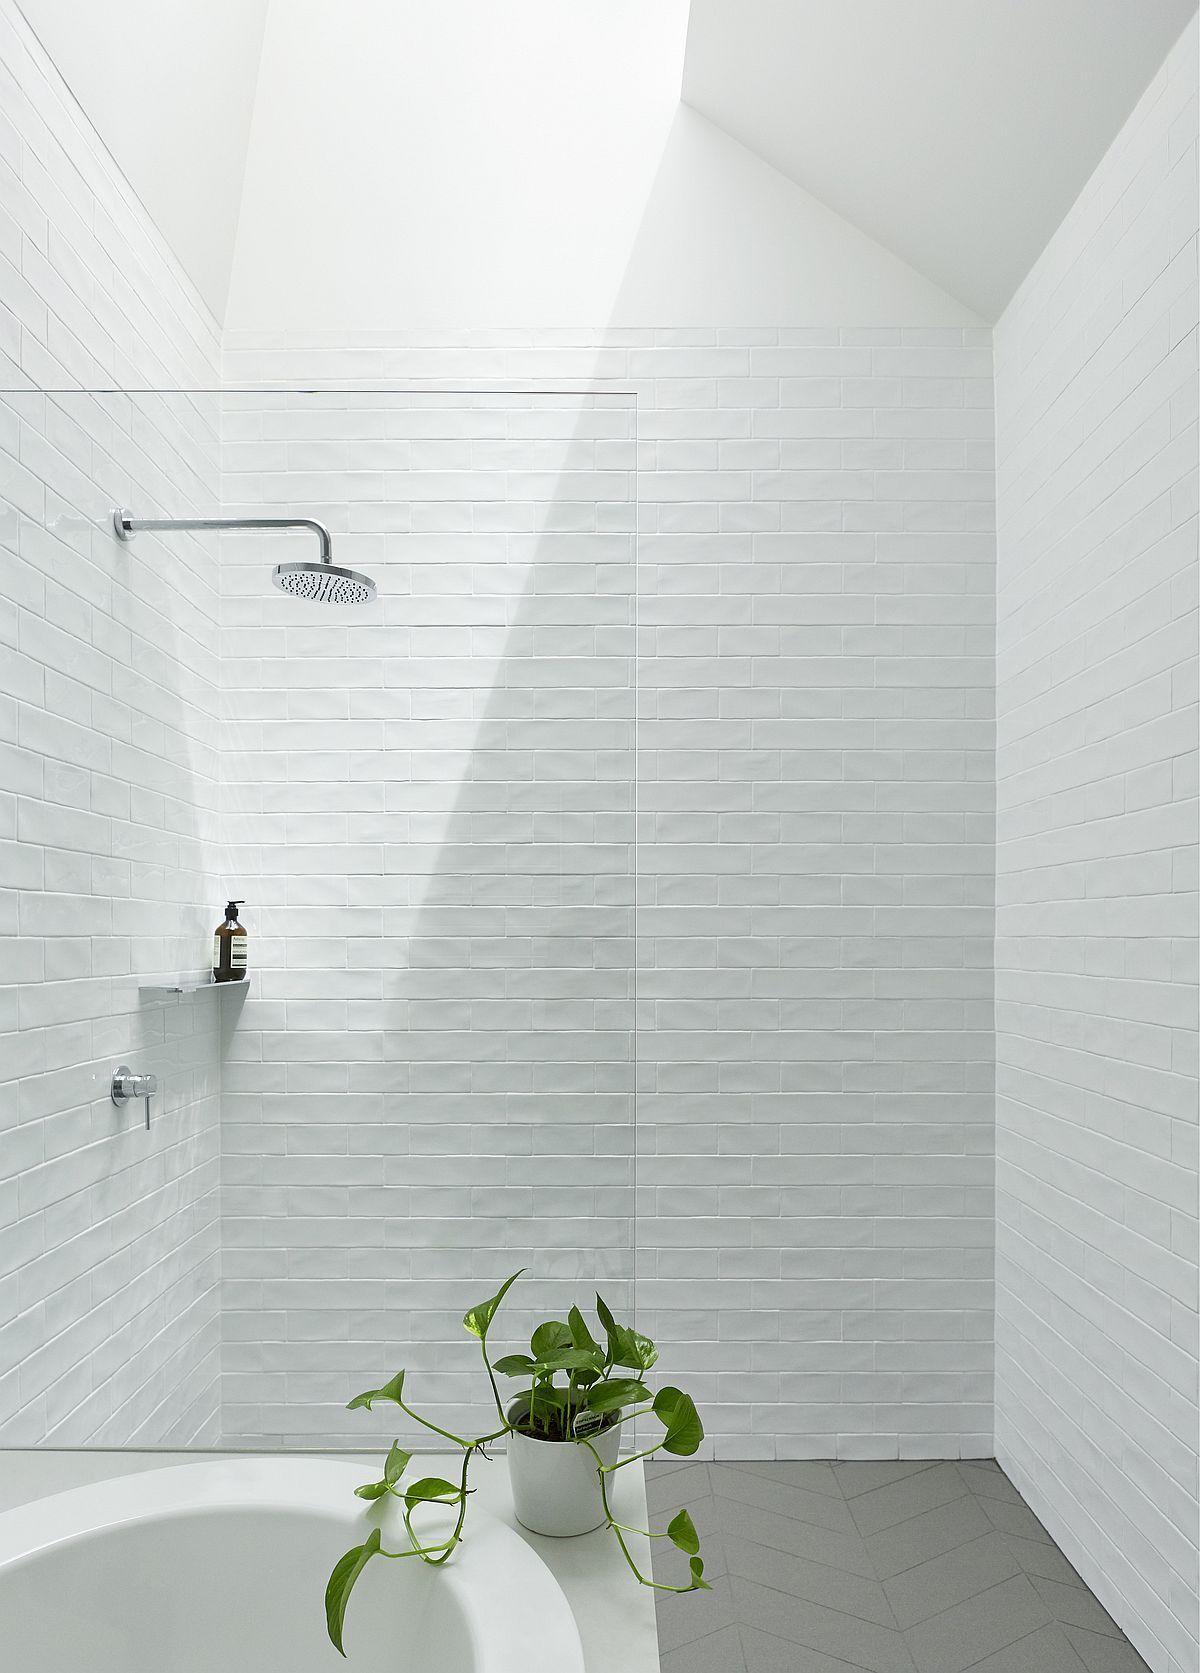 White Textured Tiles For The Bathroom With Skylight Bathroomdesignwellingtonnewzealand Modern Bathroom Design Small Bathroom Remodel Modern Bathroom